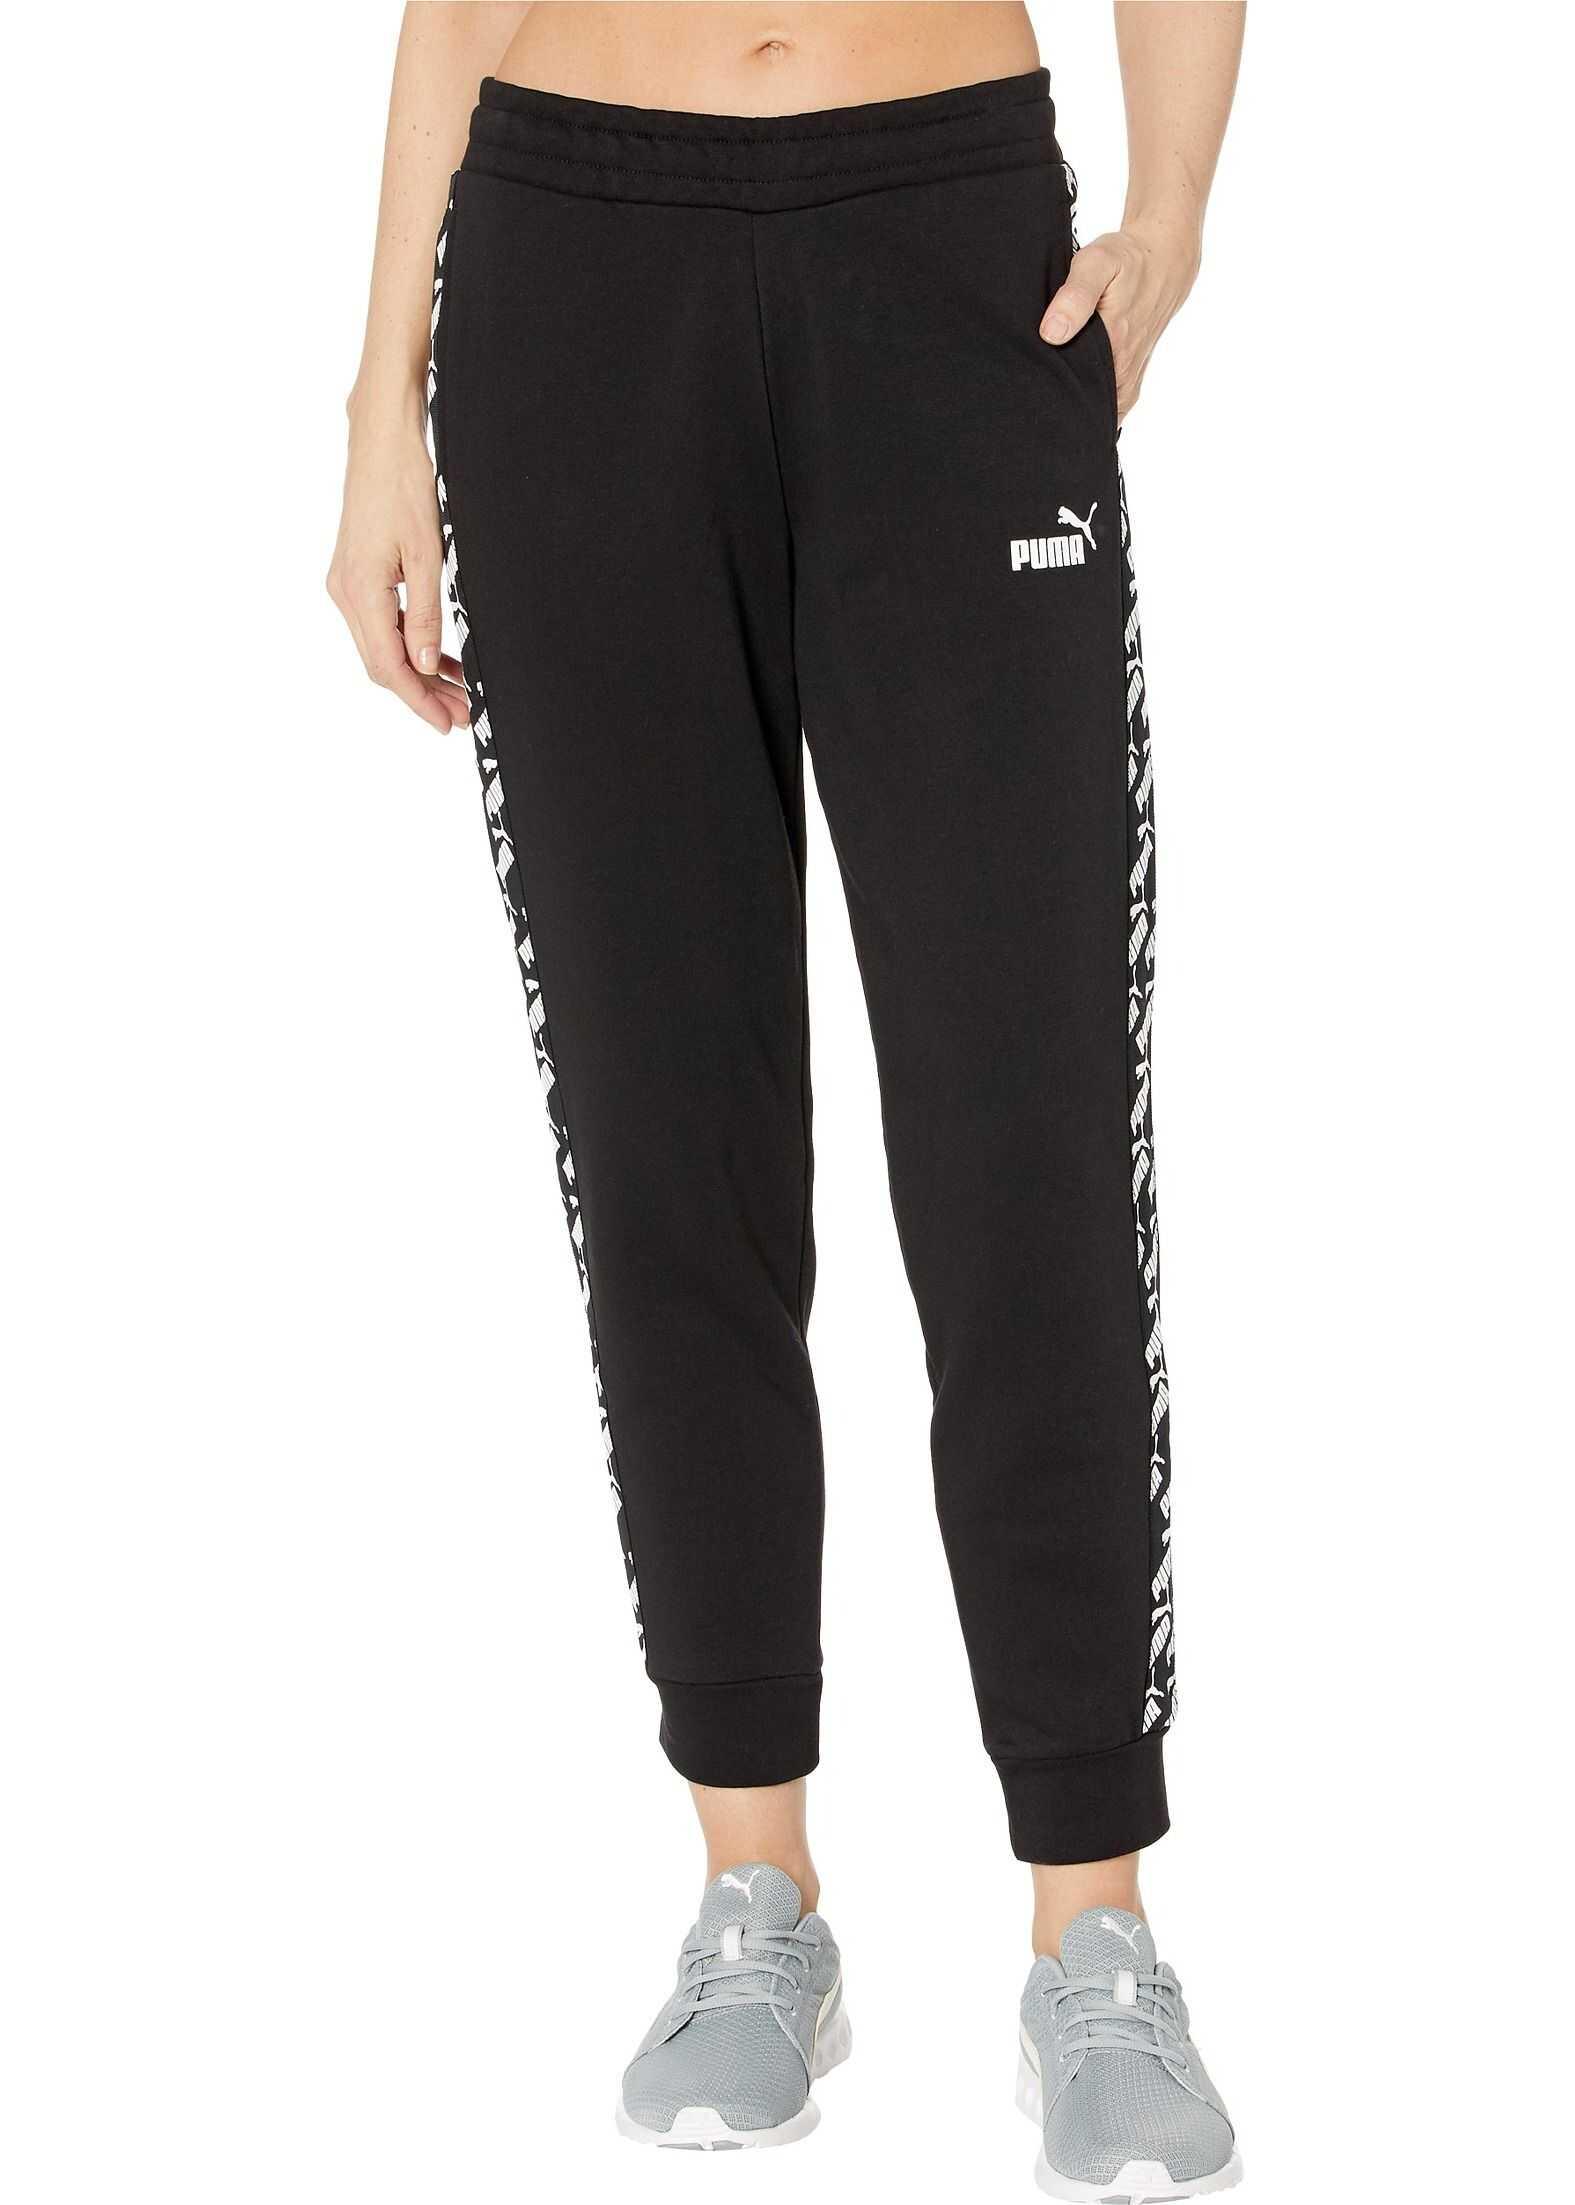 PUMA Amplified Pants PUMA Black